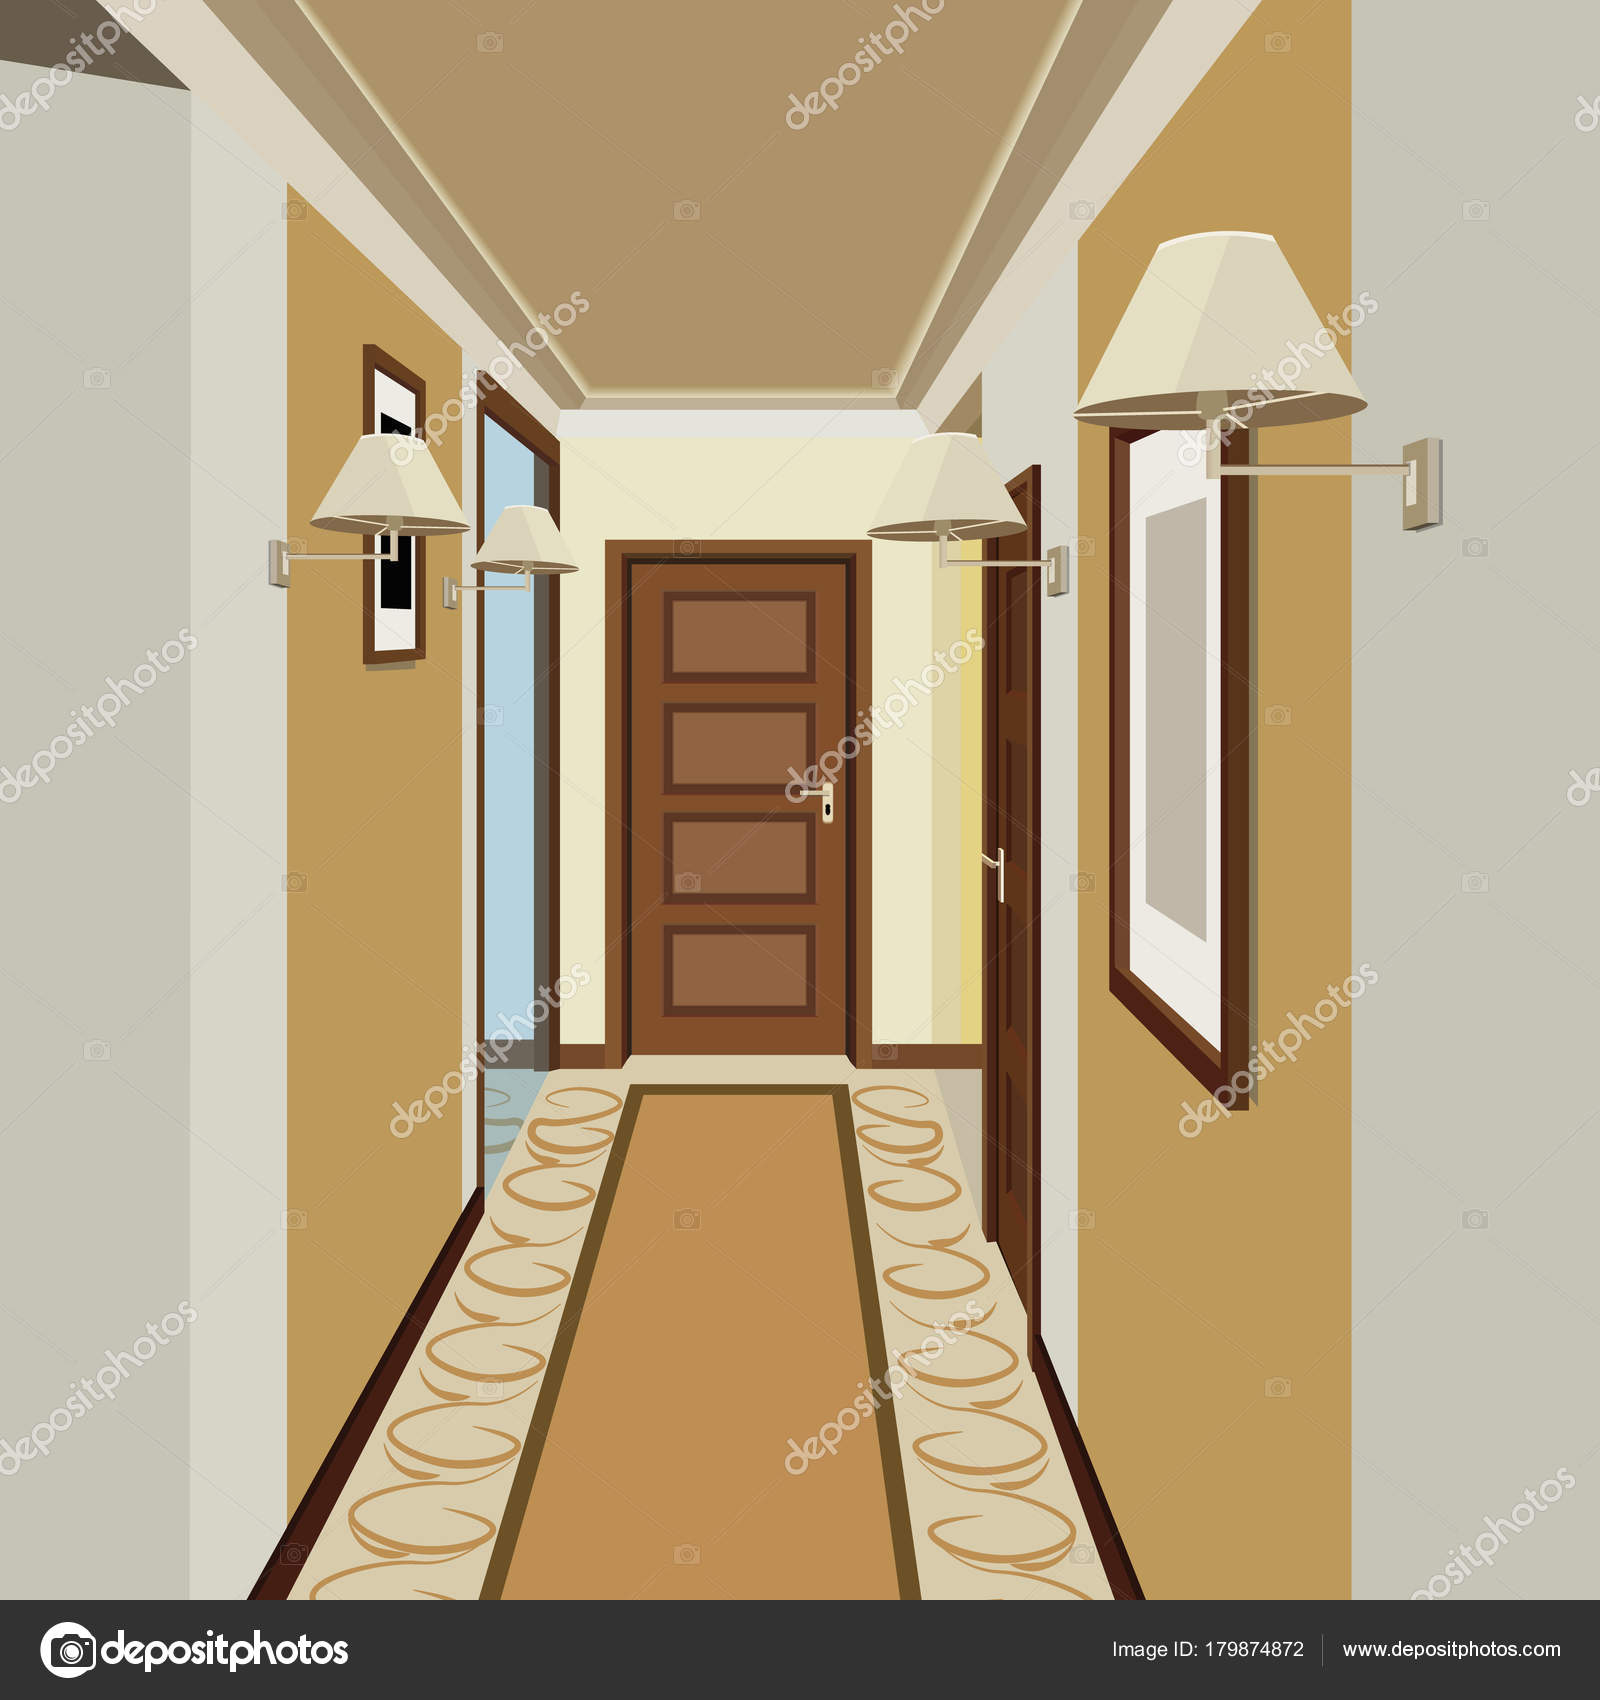 korridor innenraum hintergrund design der alten gang flur abbildung stockvektor